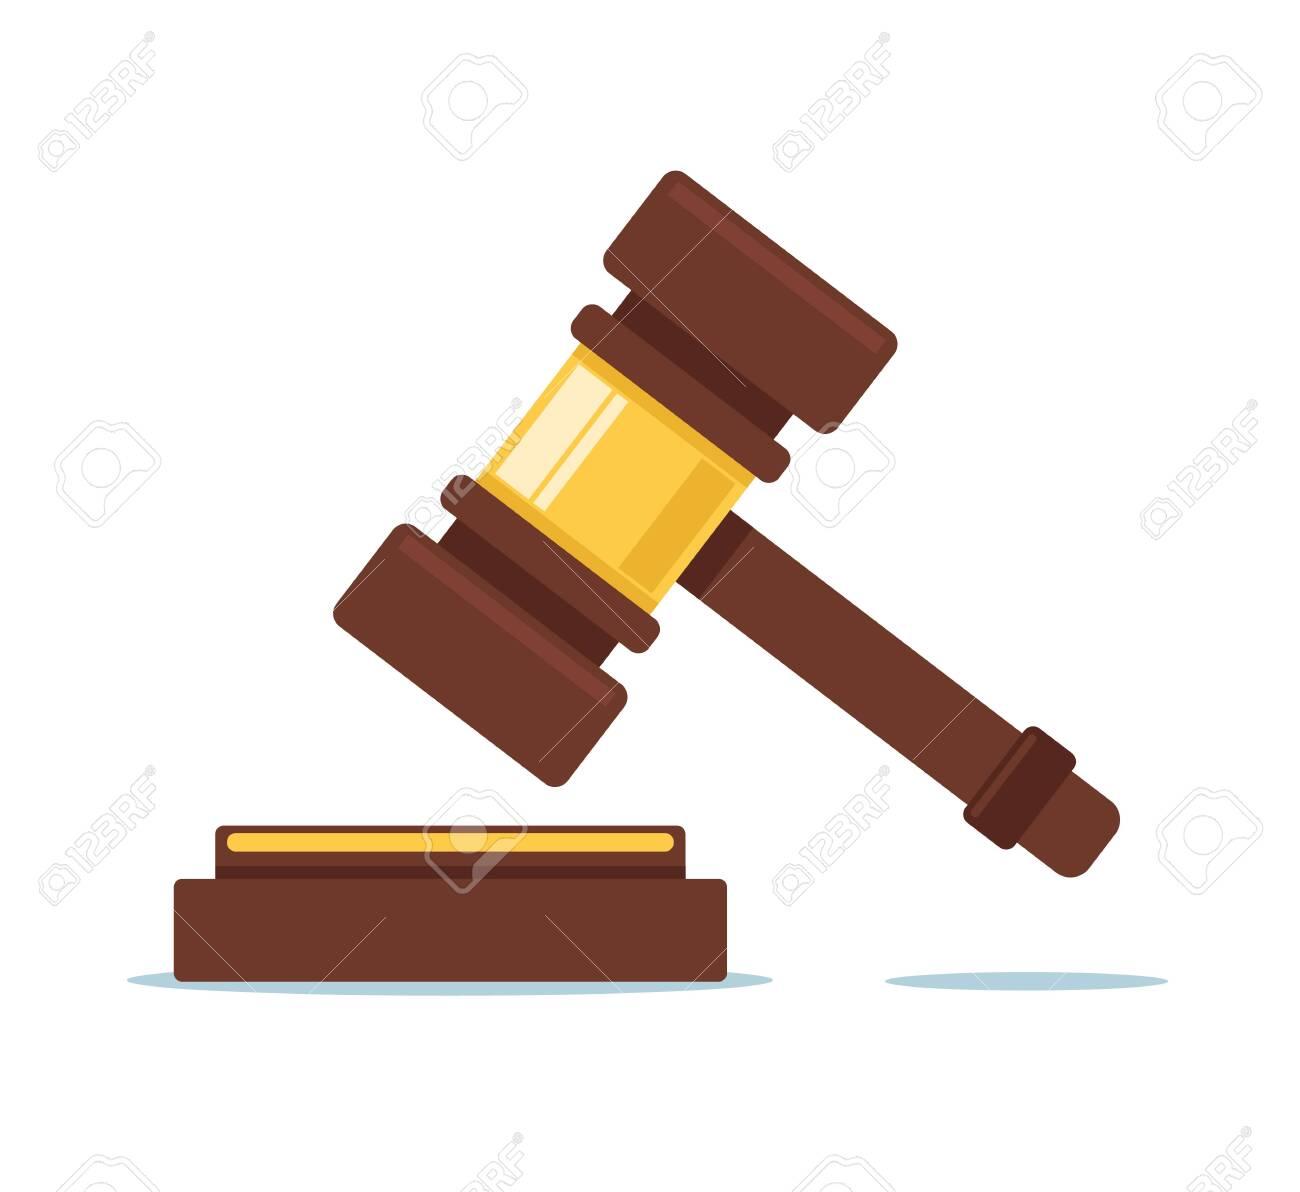 Judicial judge court hammer concept. Vector flat cartoon graphic design illustration - 132260189